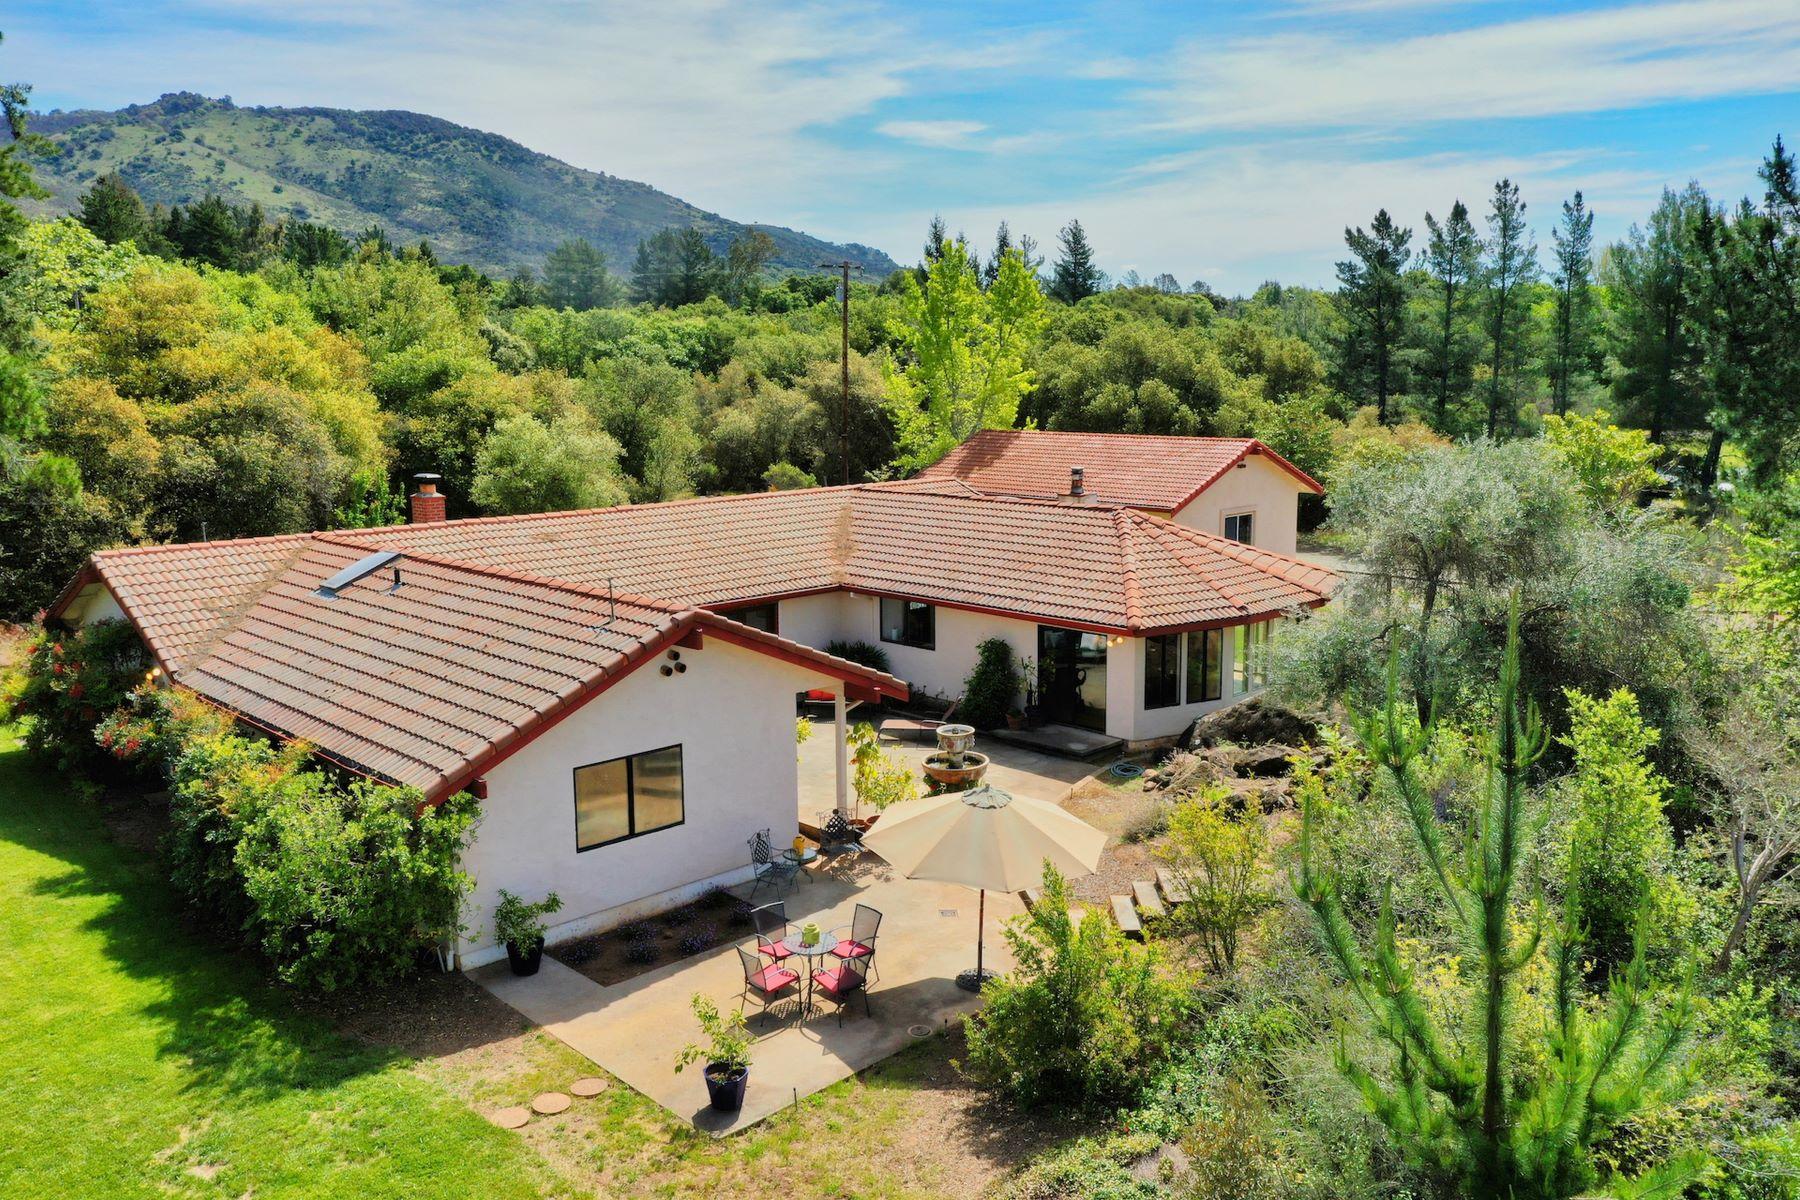 Single Family Homes for Active at Blue Skies and Scenic Views in Napa Valley 3497 Soda Canyon Road Napa, California 94558 United States